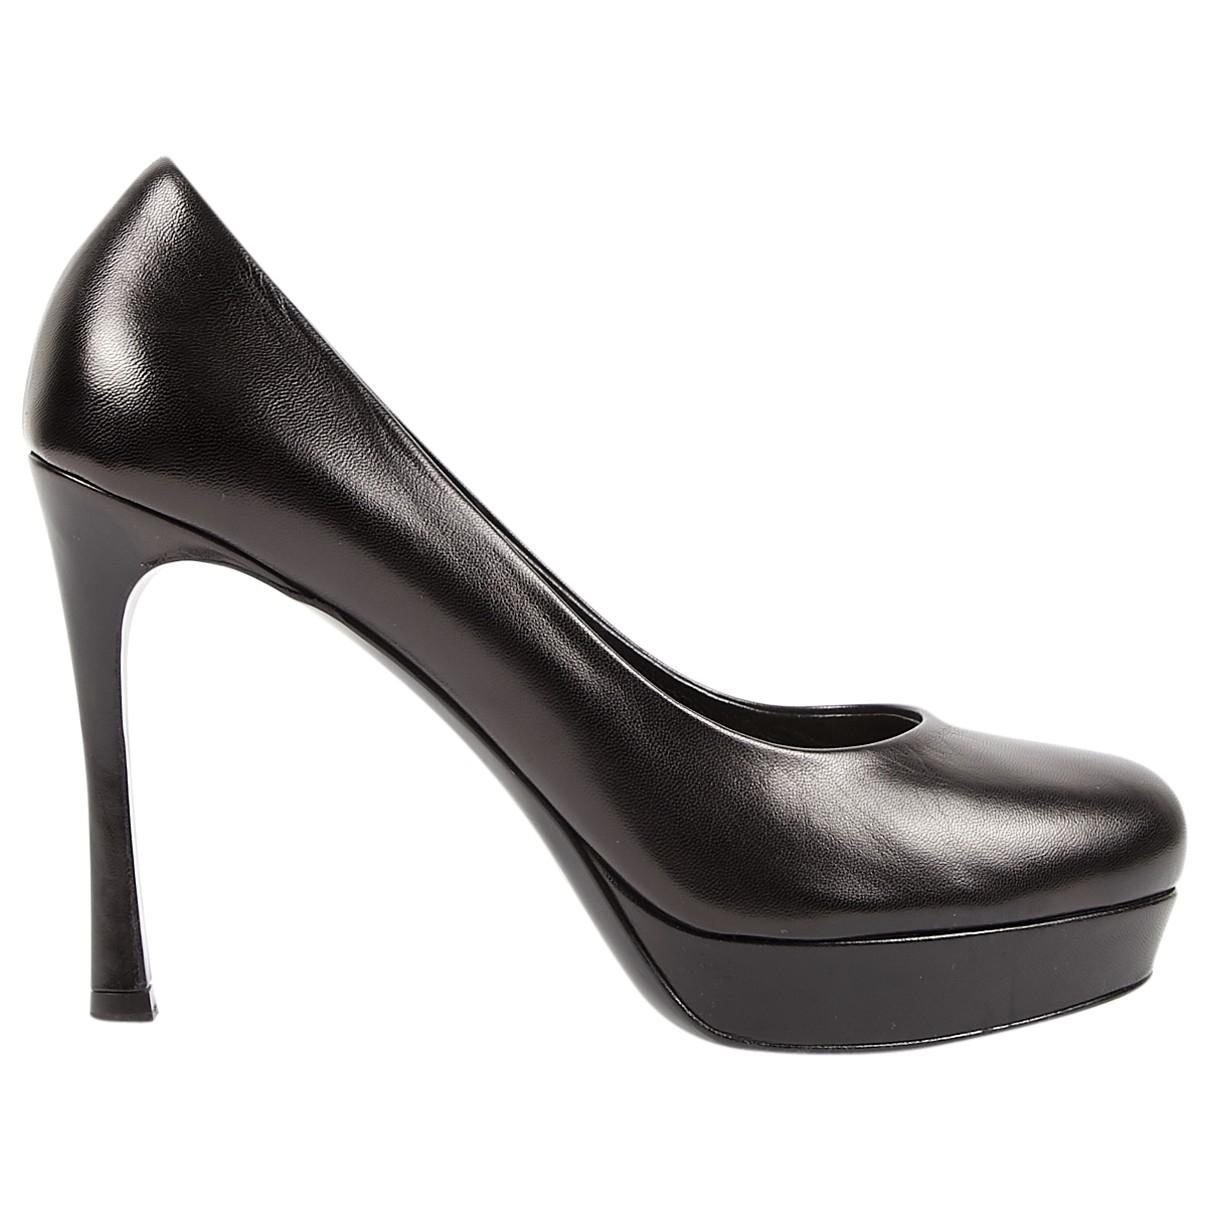 Yves Saint Laurent Trib Too Black Leather Heels for Women 40.5 EU